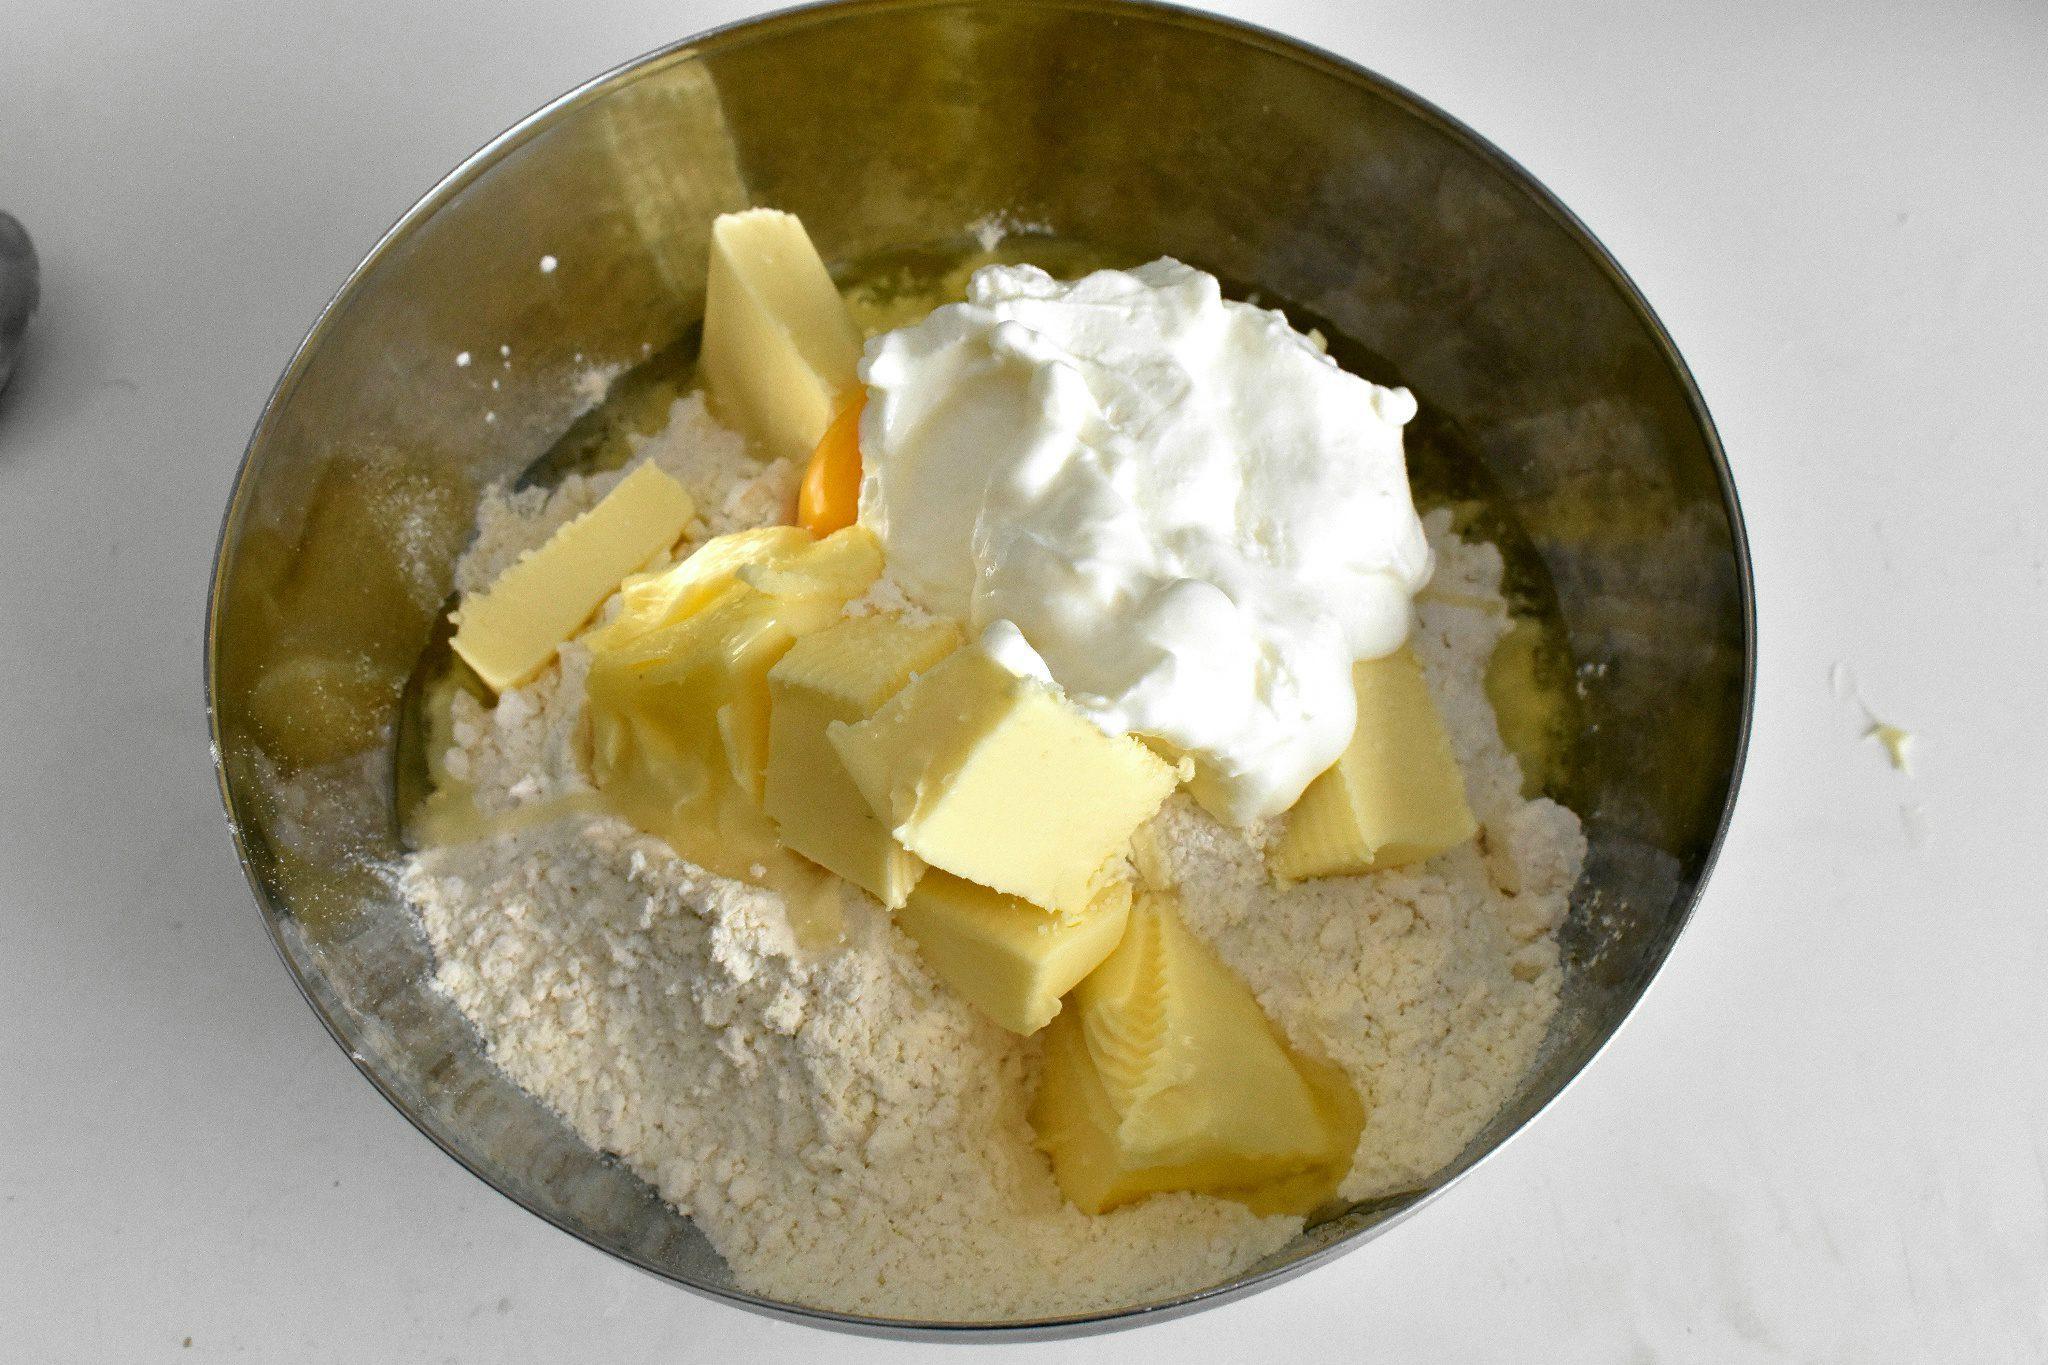 Easy-cheese-scone-recipe-process-2-SunCakeMom